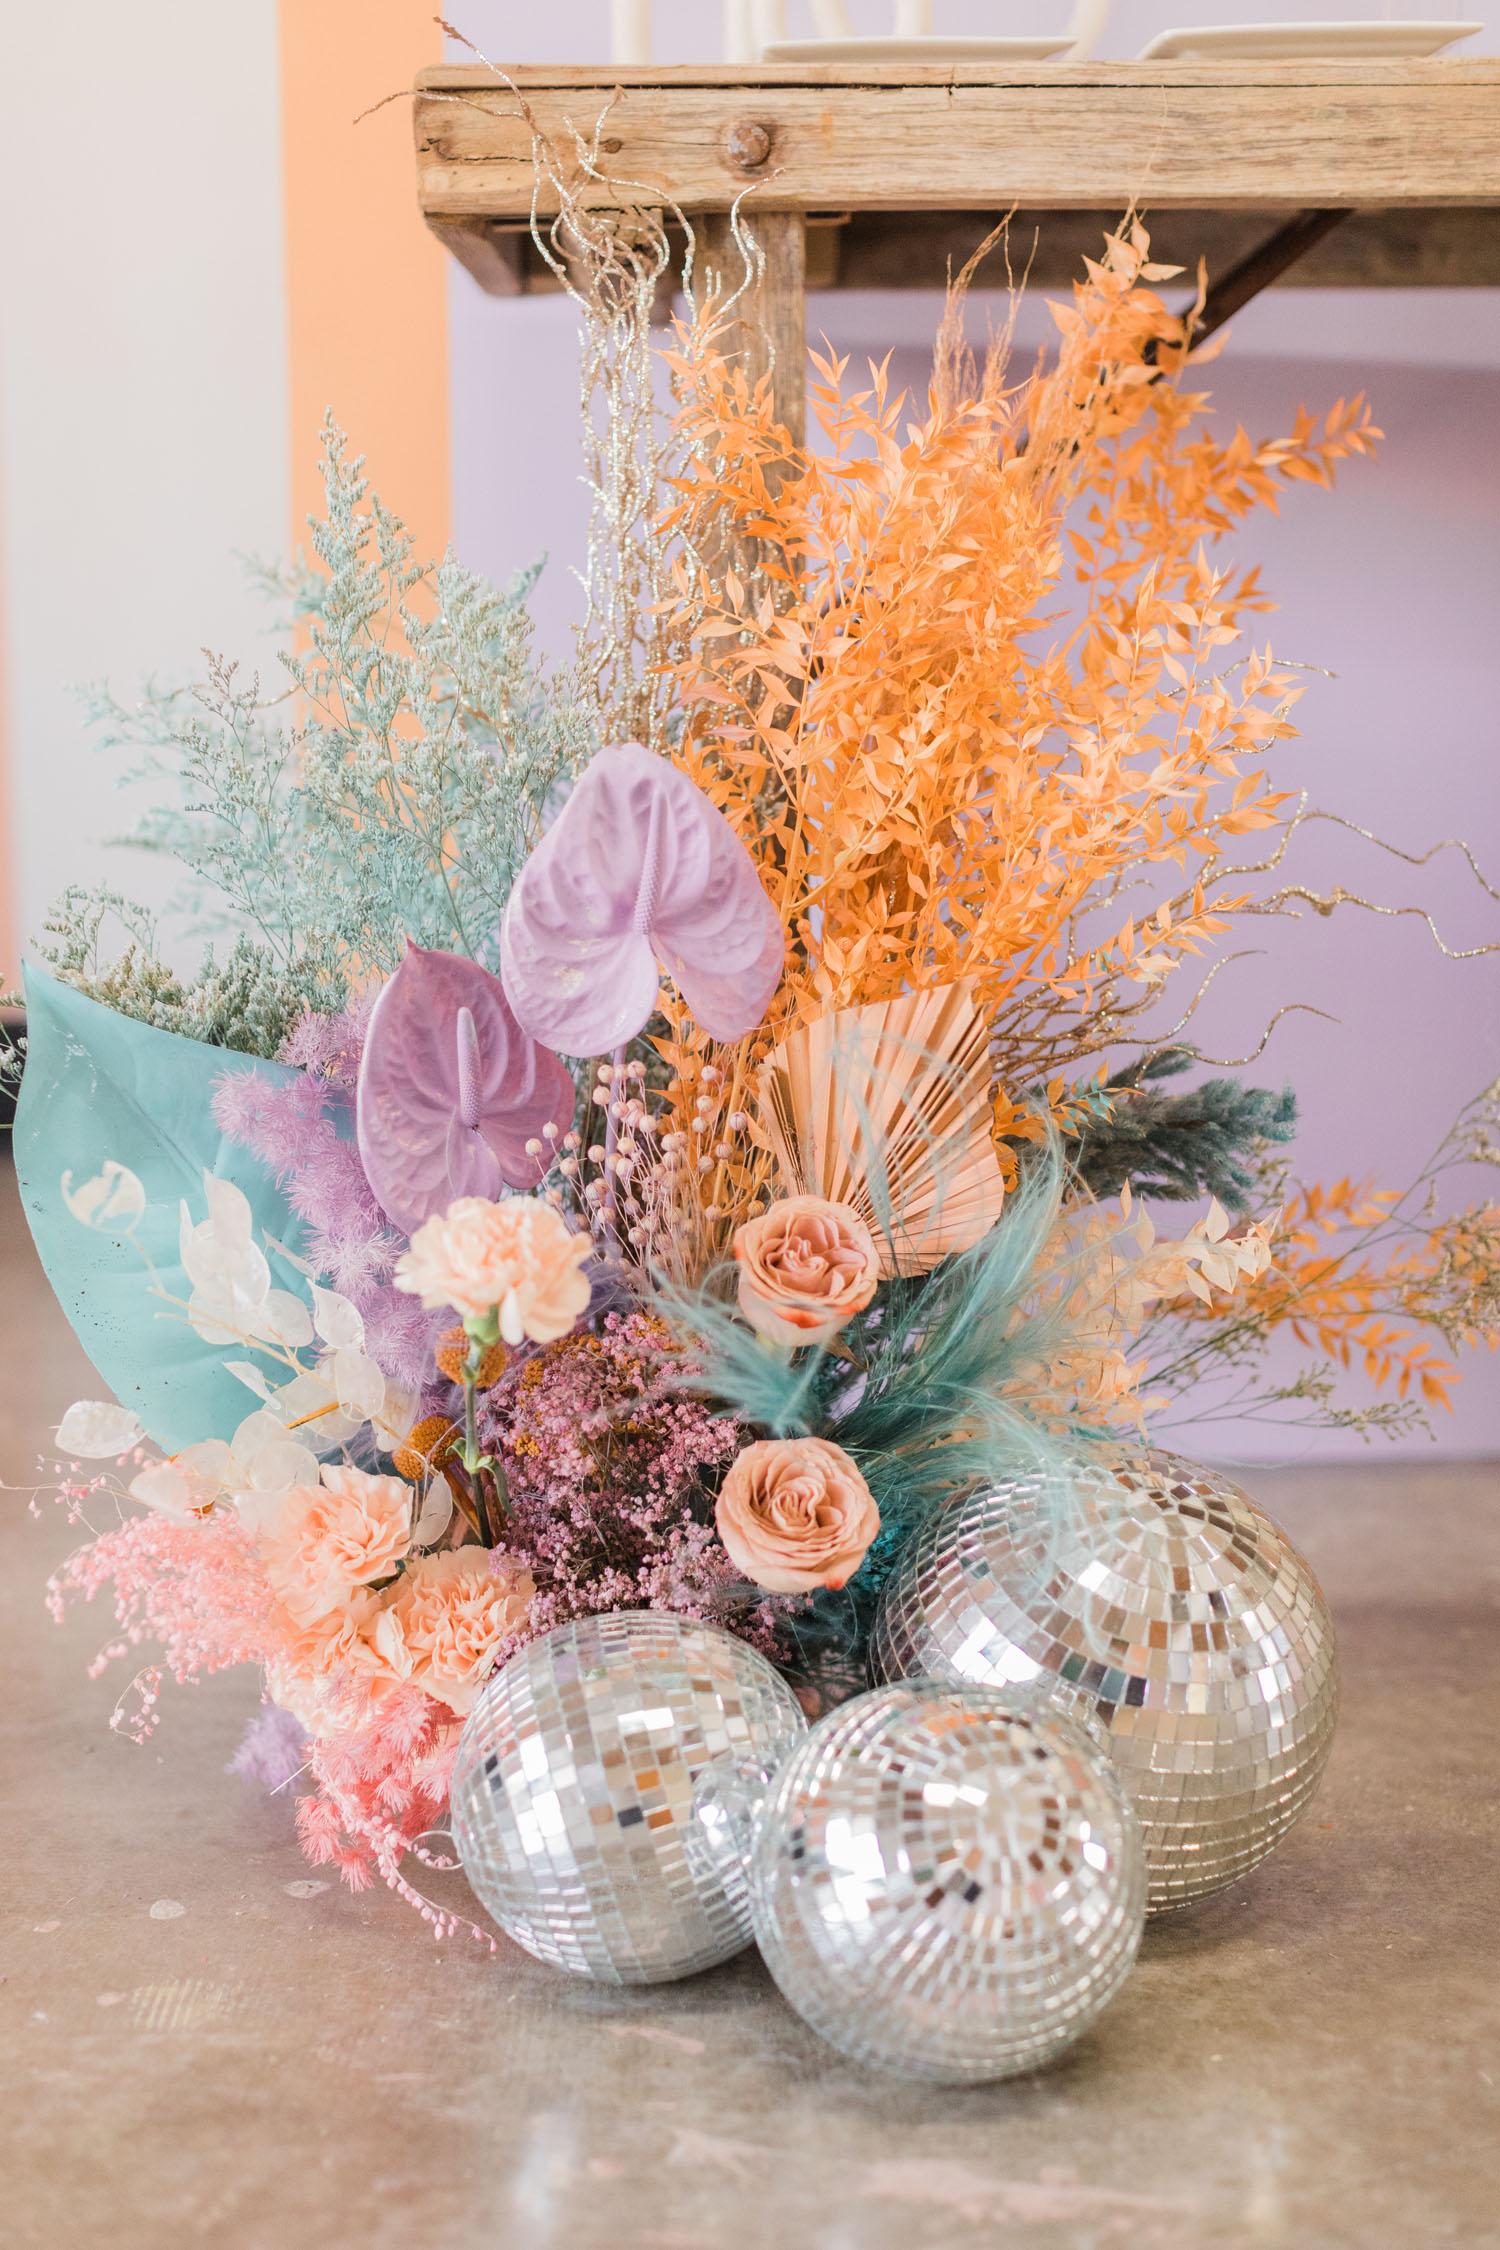 Disco ball flowers